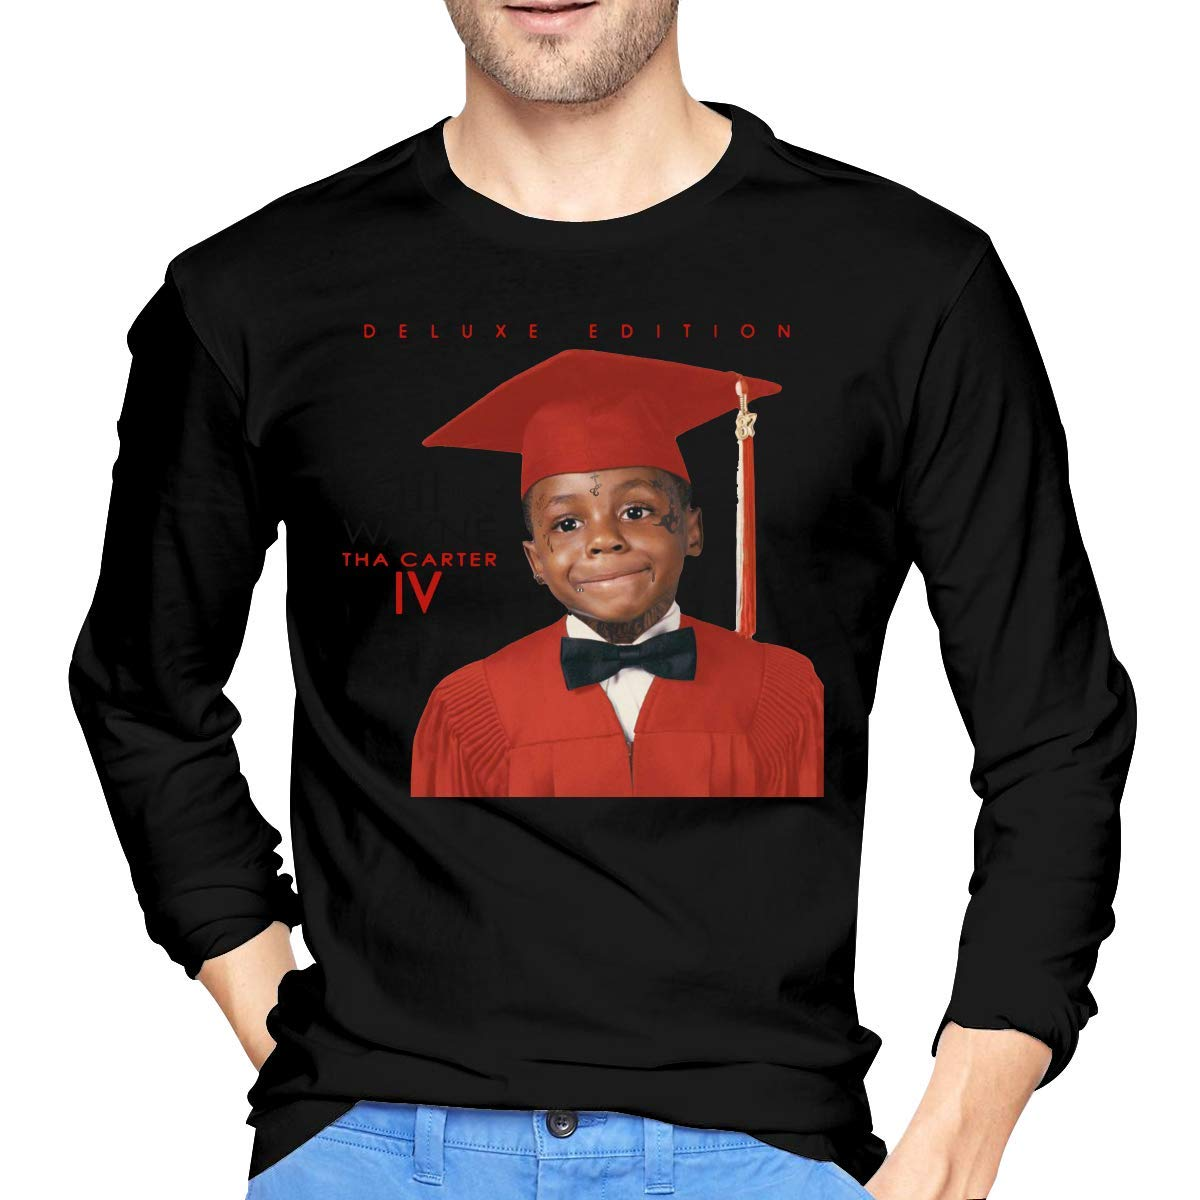 Fssatung S Lil Wayne Tha Carter Iv Tshirts Black